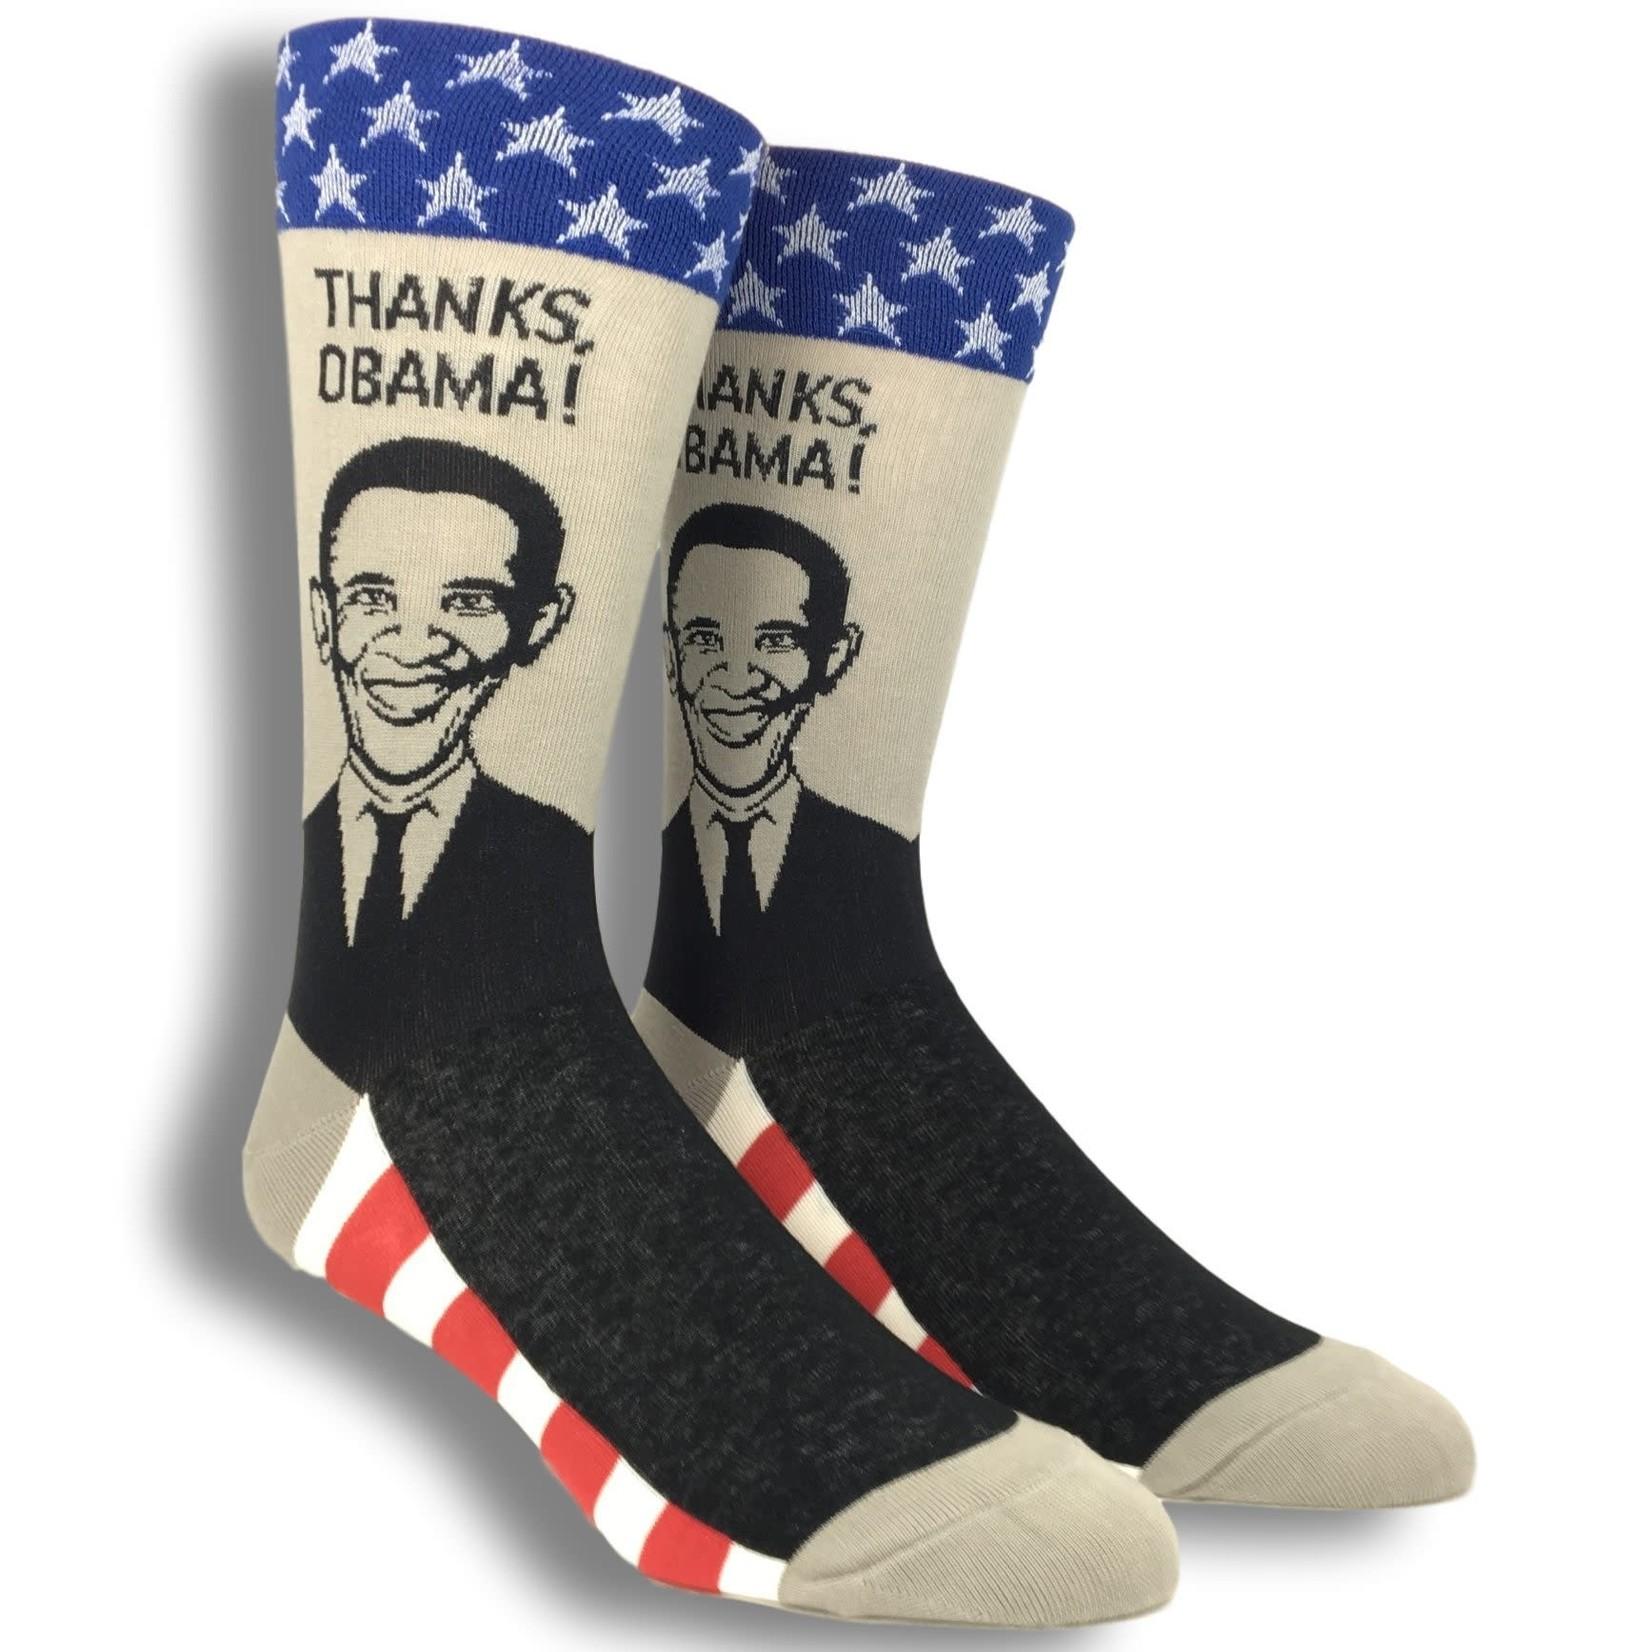 Socks (Womens) - Thanks Obama